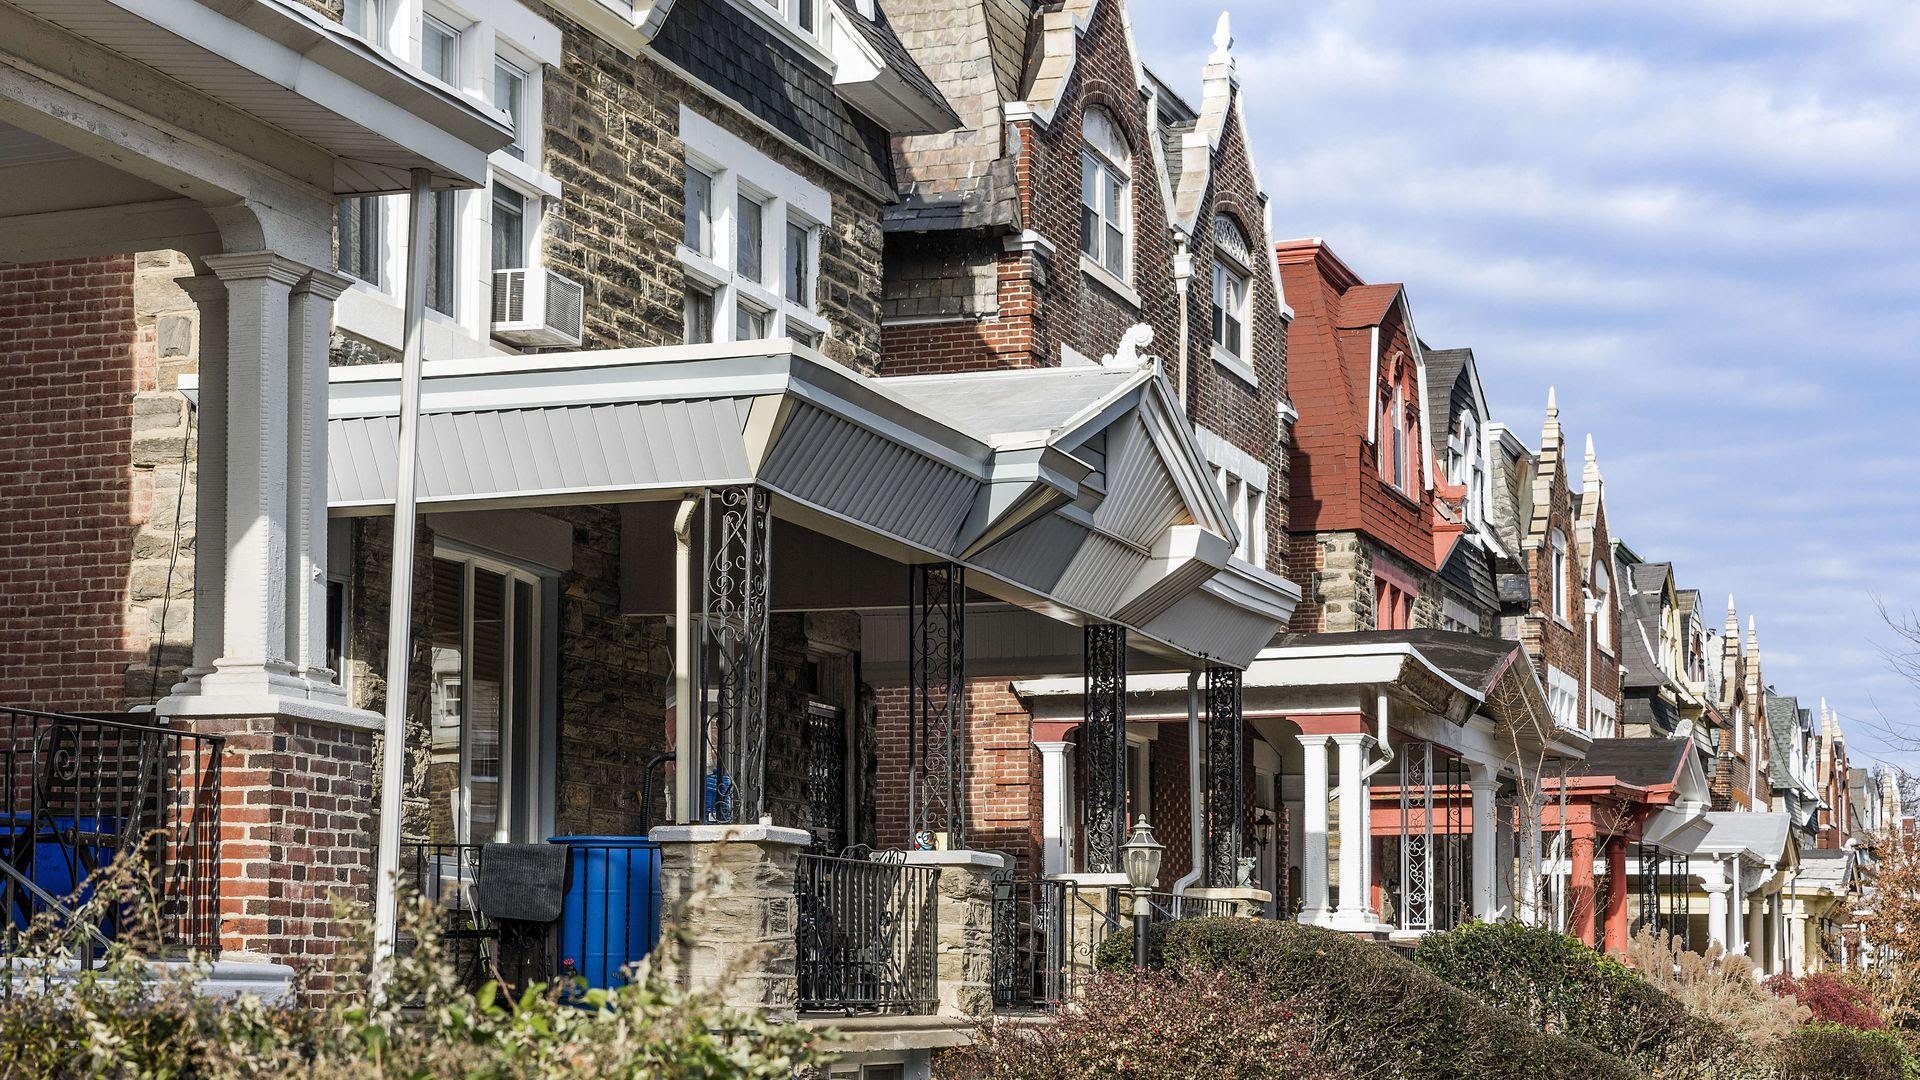 Row homes in Philadelphia's Mt. Airy neighborhood.